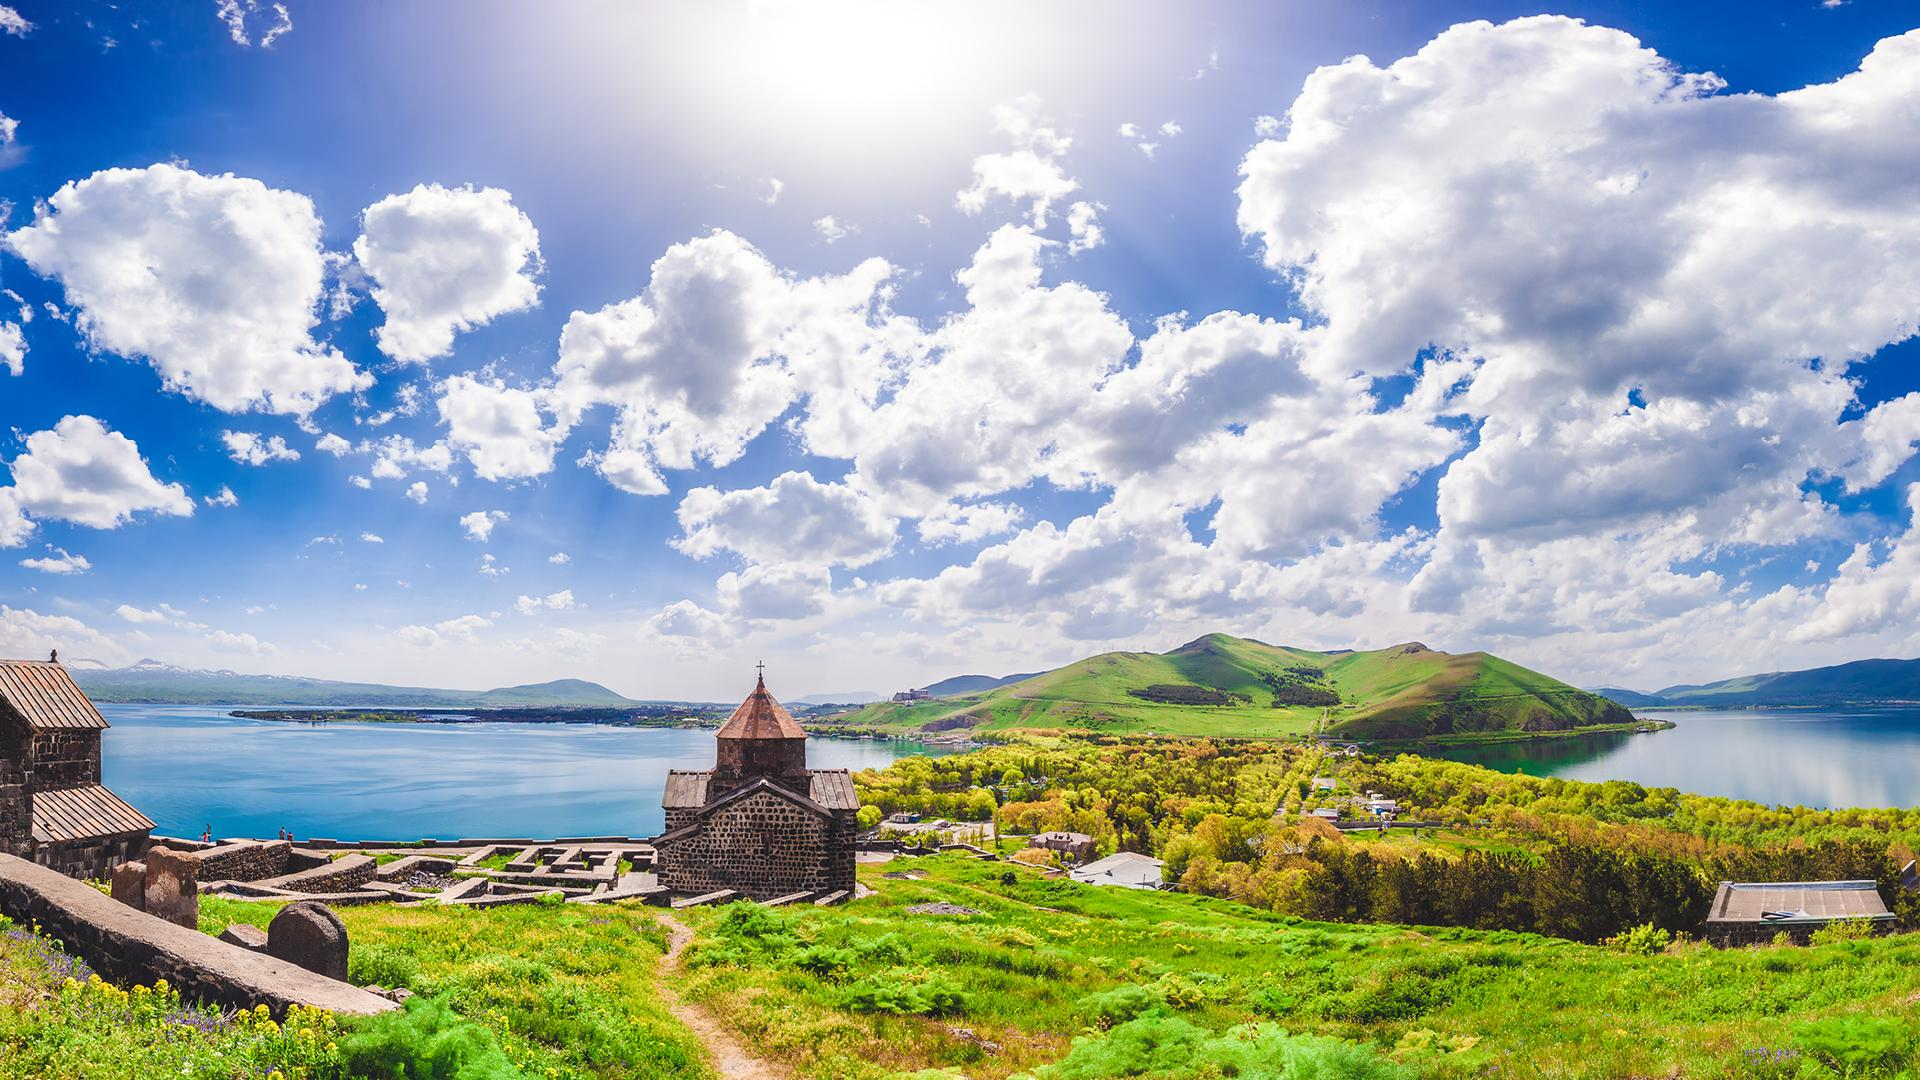 Incredible 13-Day Tour of Azerbaijan, Georgia and Armenia with